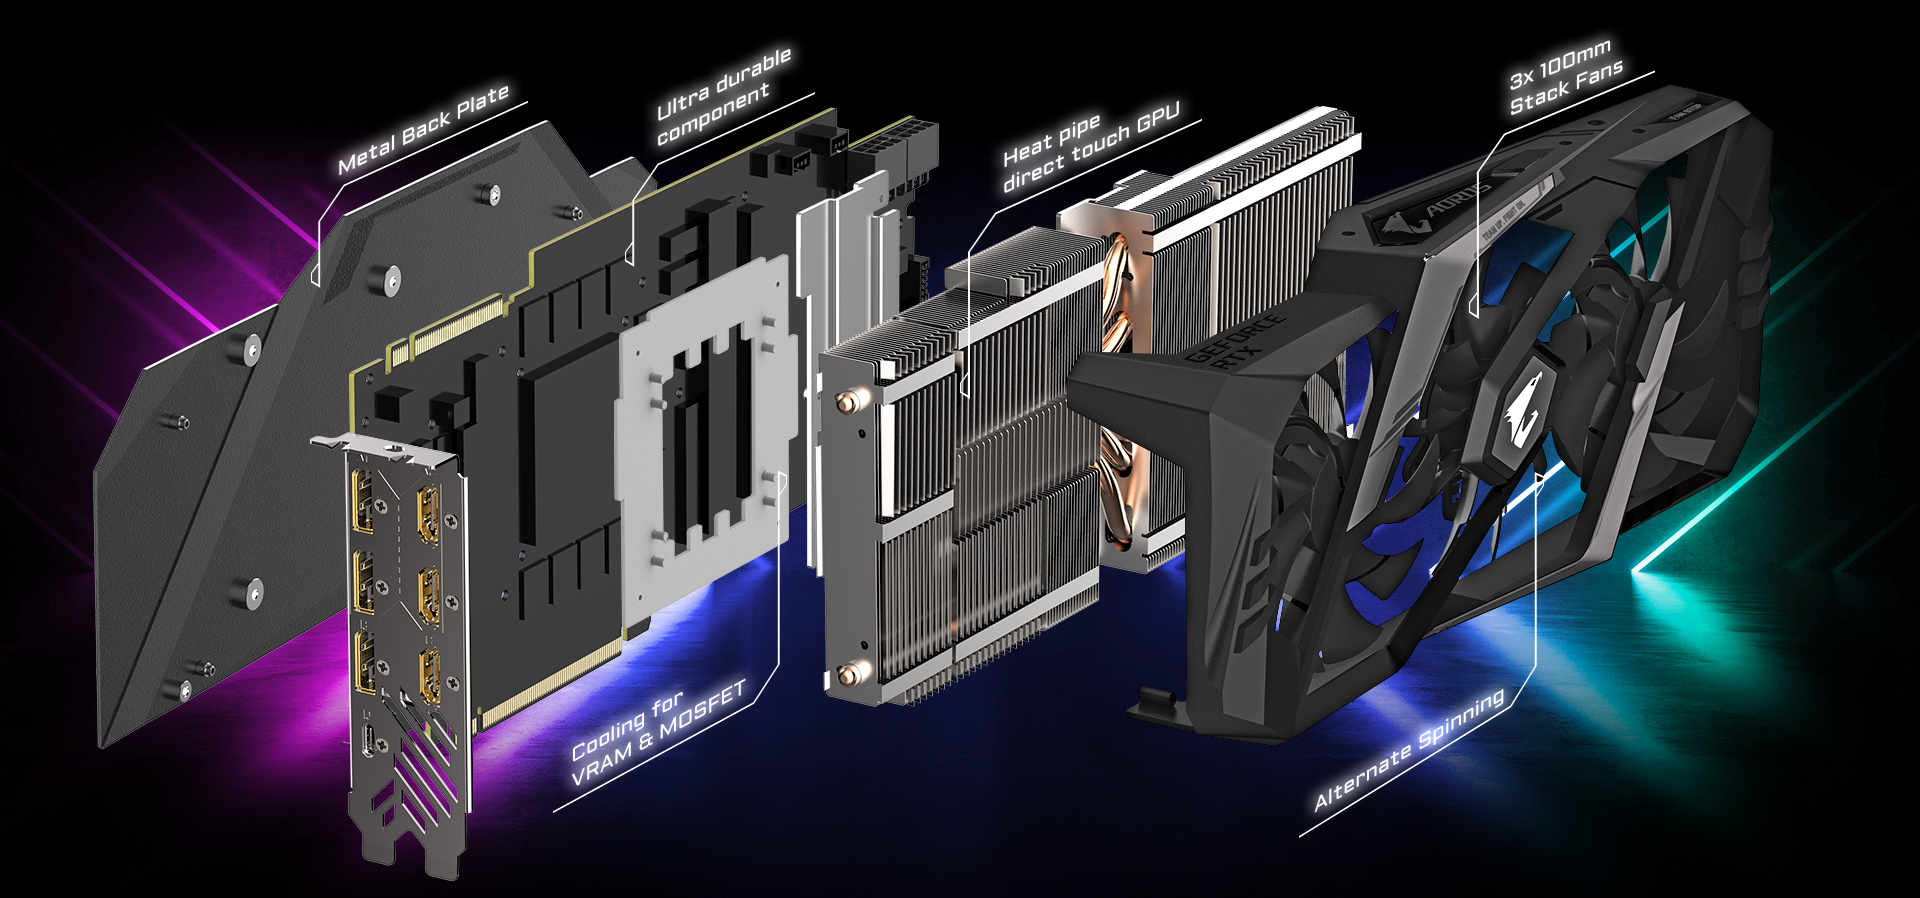 AORUS GeForce® RTX 2070 SUPER™ 8G | Graphics Card - GIGABYTE